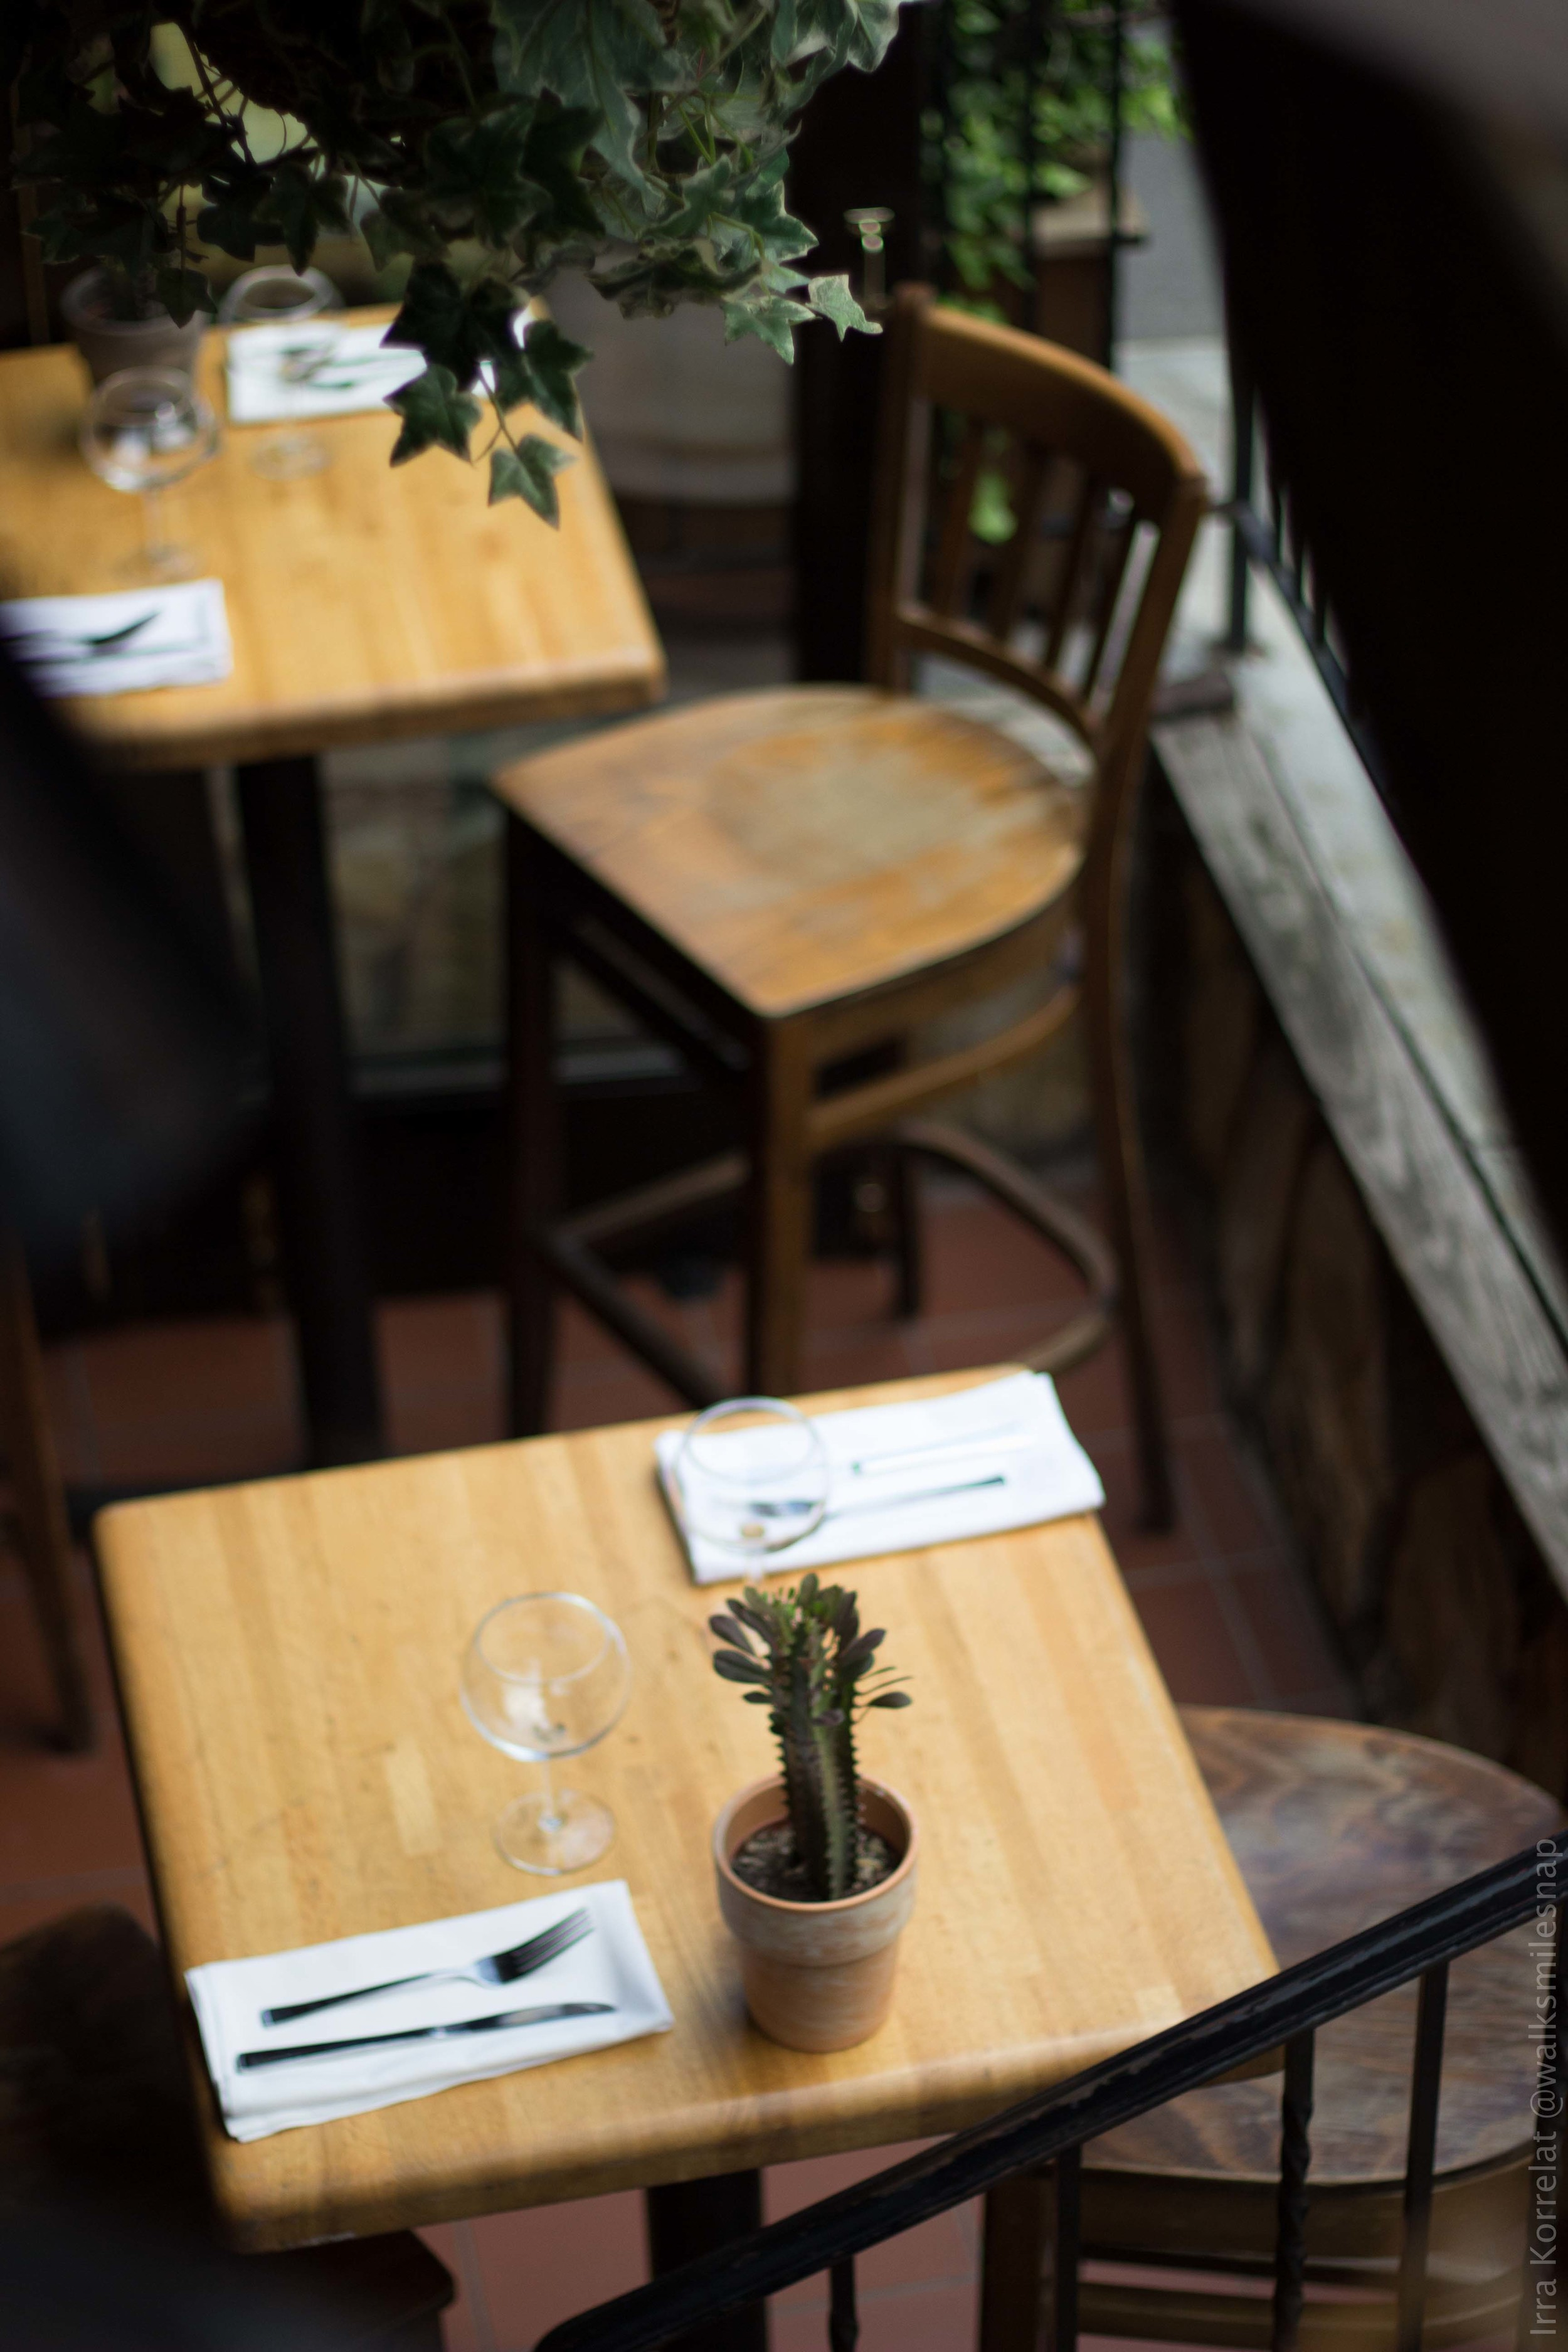 west village cafe restaurant table napkin chair wooden table rustic irra korrelat walksmilesnap.jpg